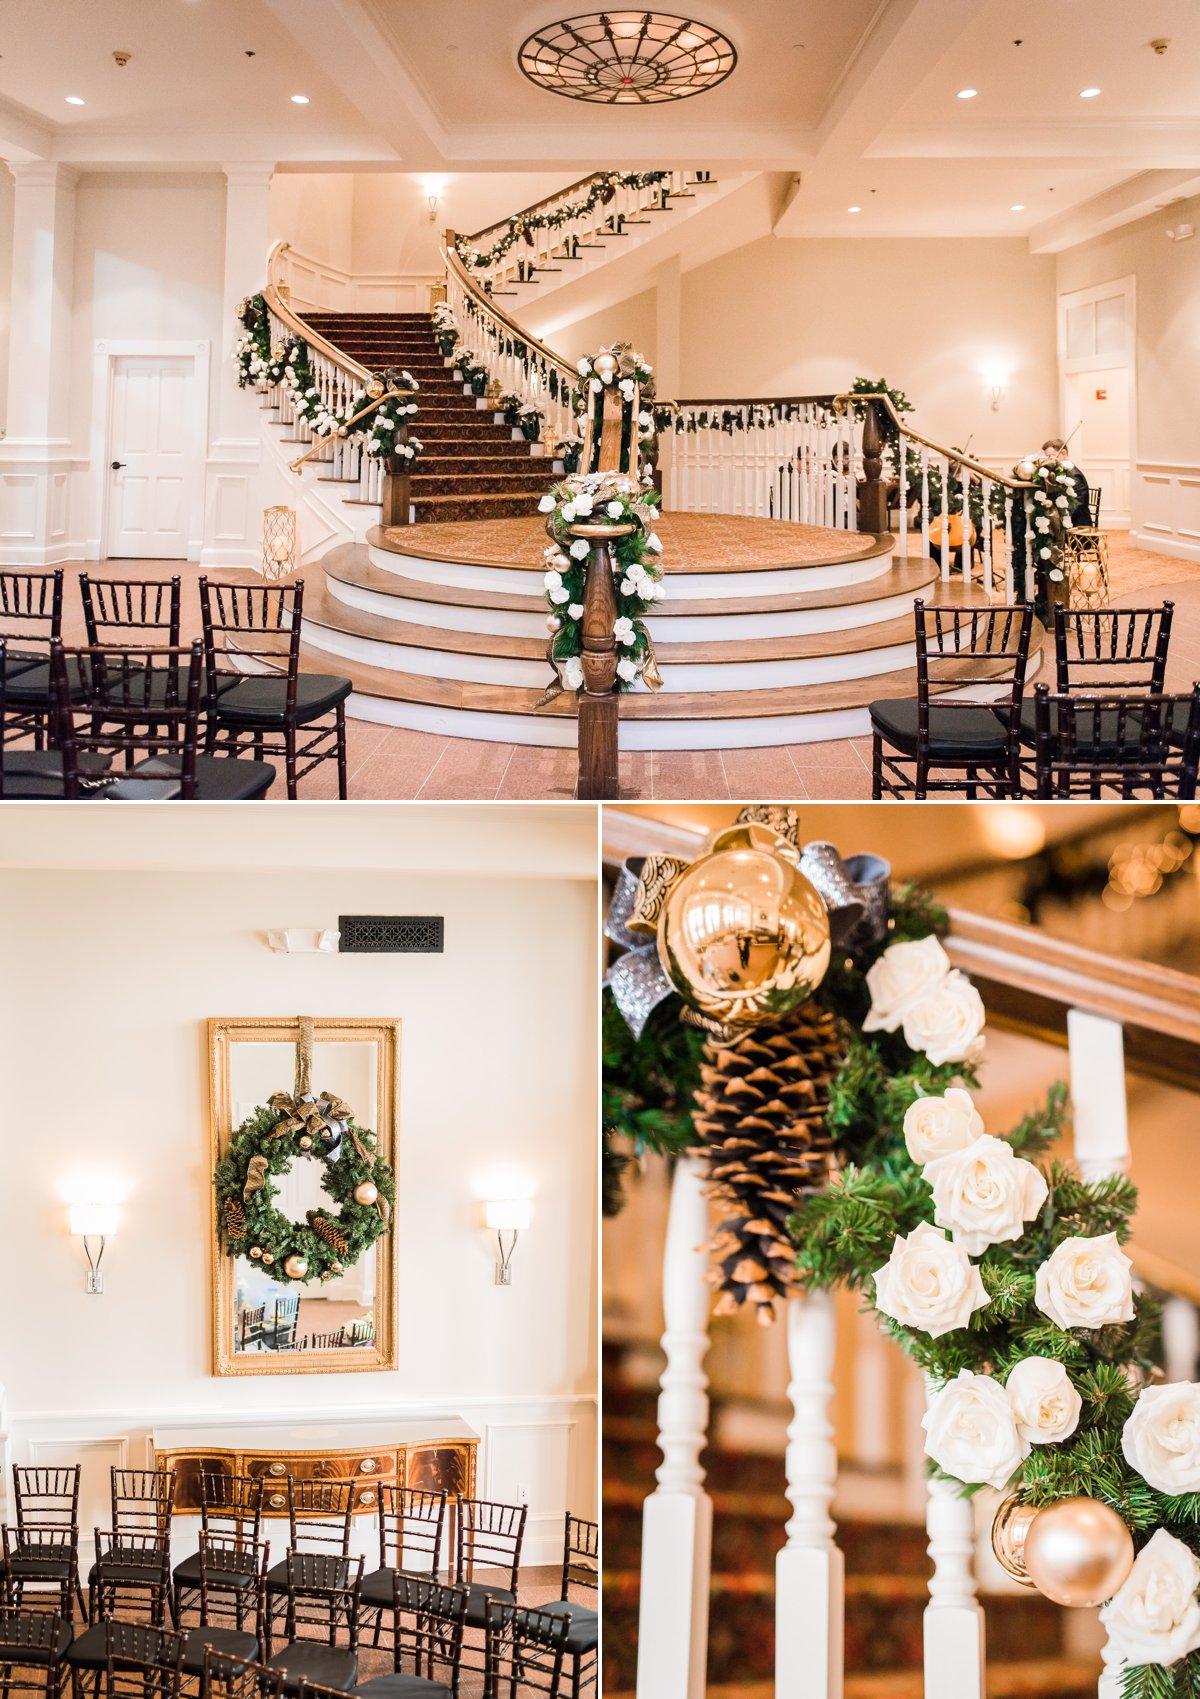 Tremont House Wedding Interior Photos